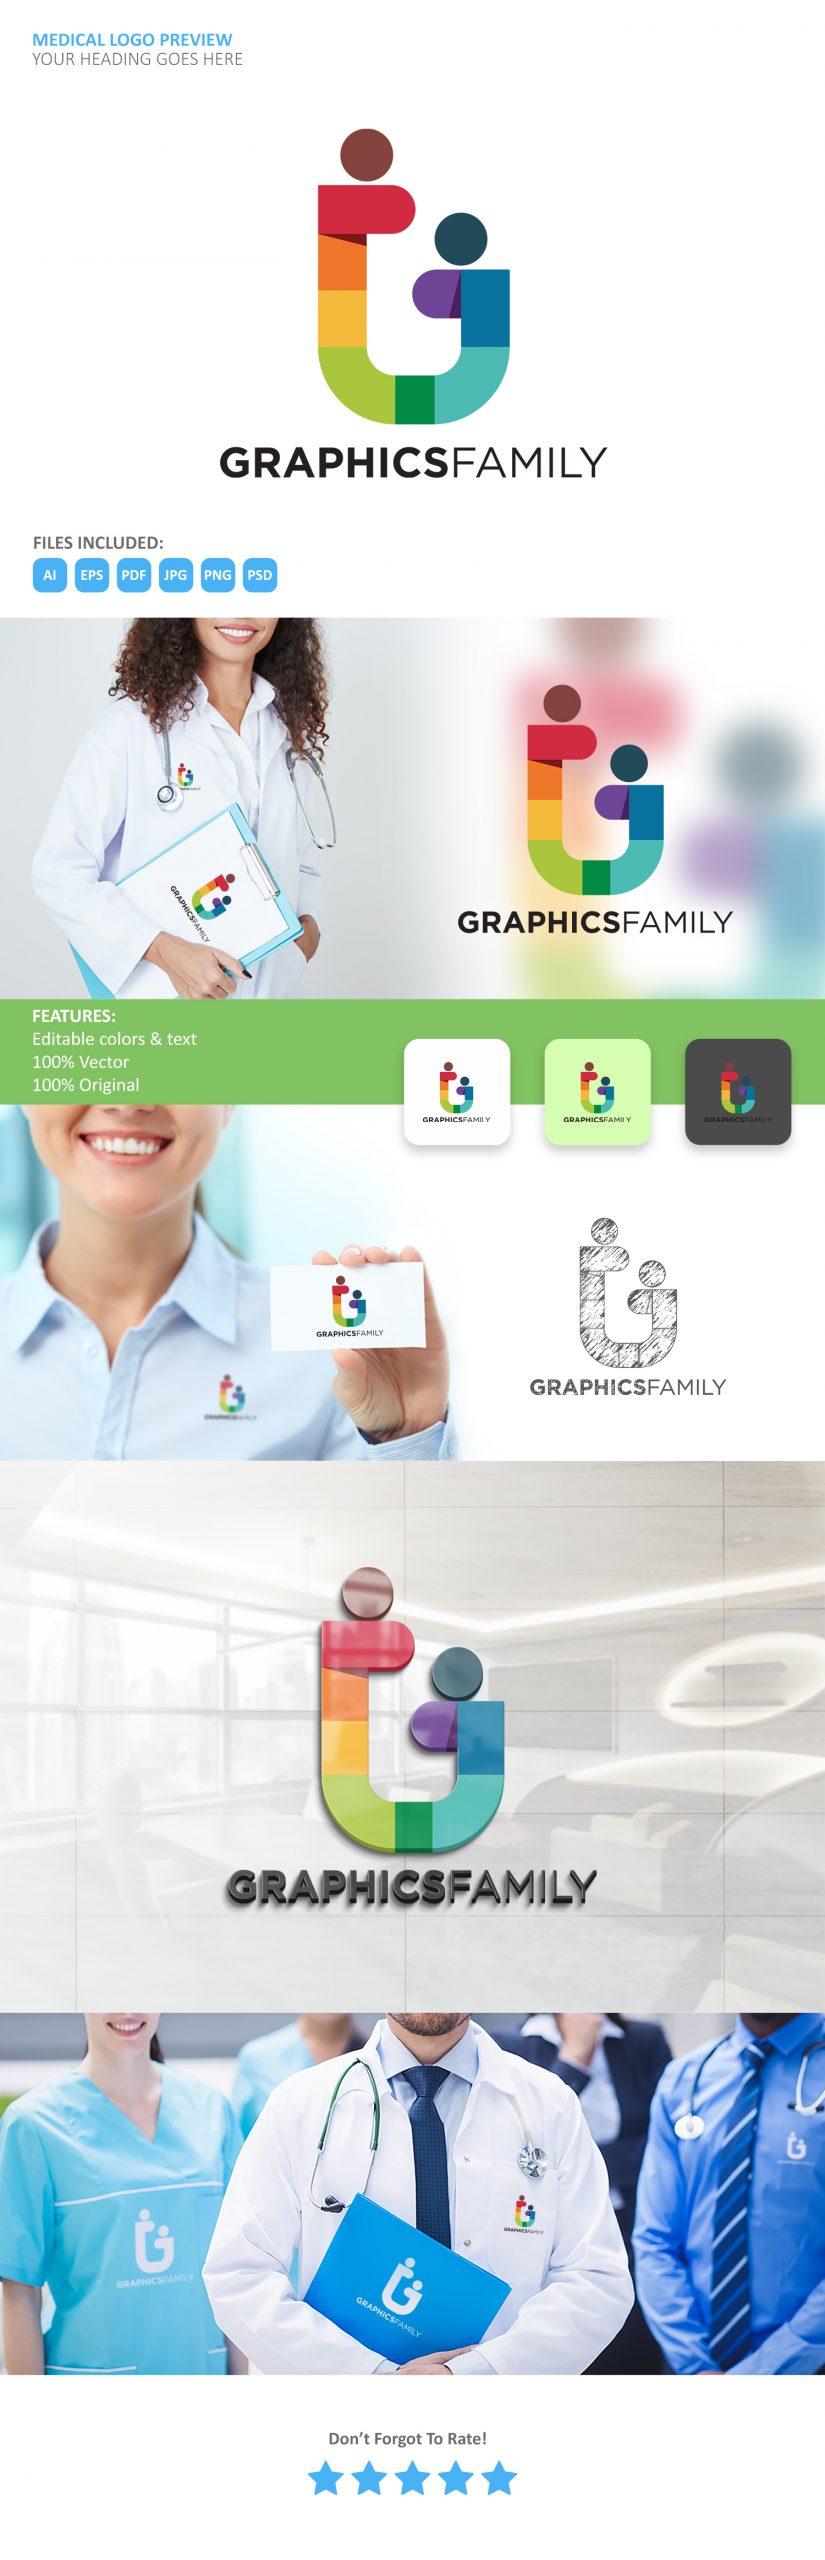 Medical Logo Thumbnail Generator GraphicsFamily